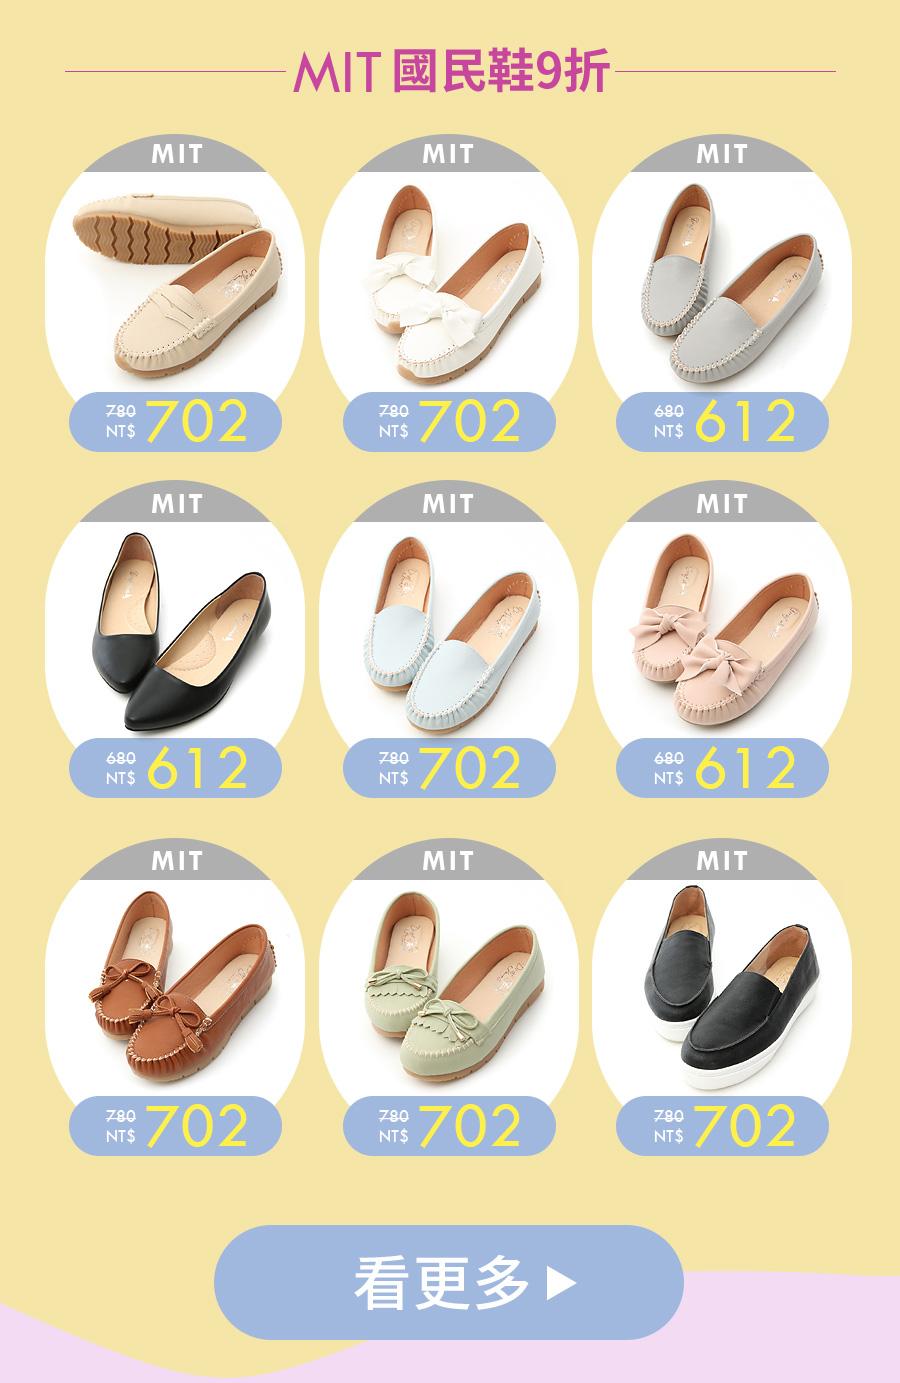 MIT國民鞋9折